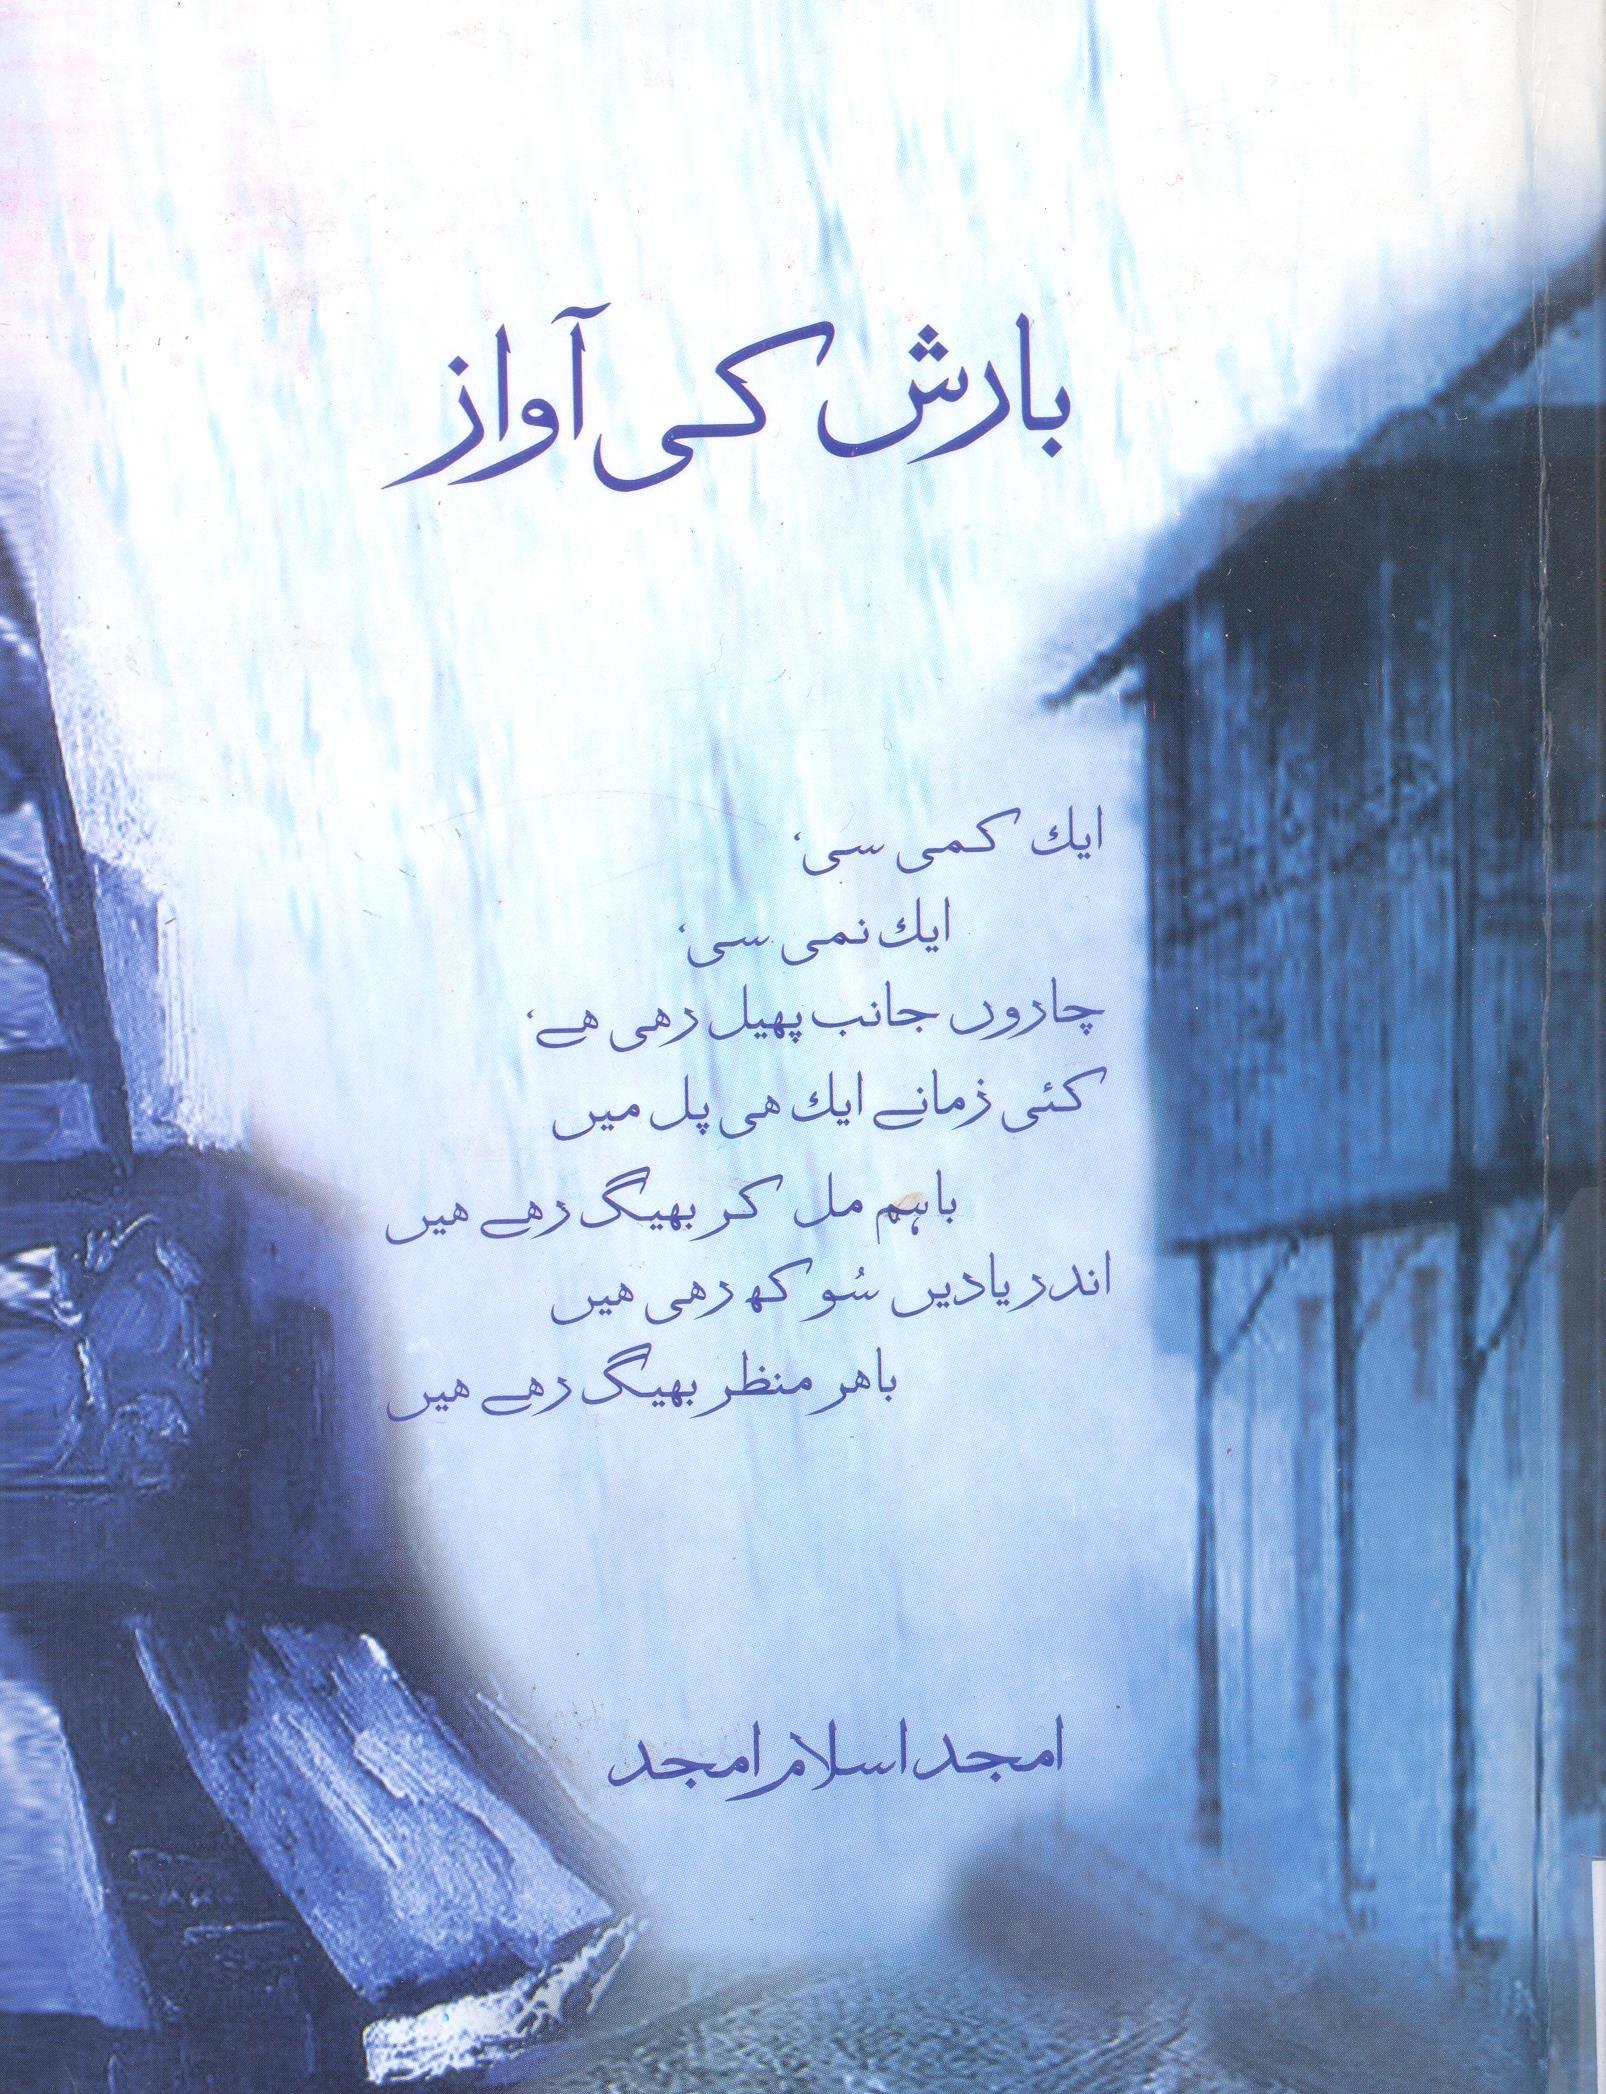 Barish Ki Awaz / Amjad Islam Amjad   Poetry feelings, Love ...